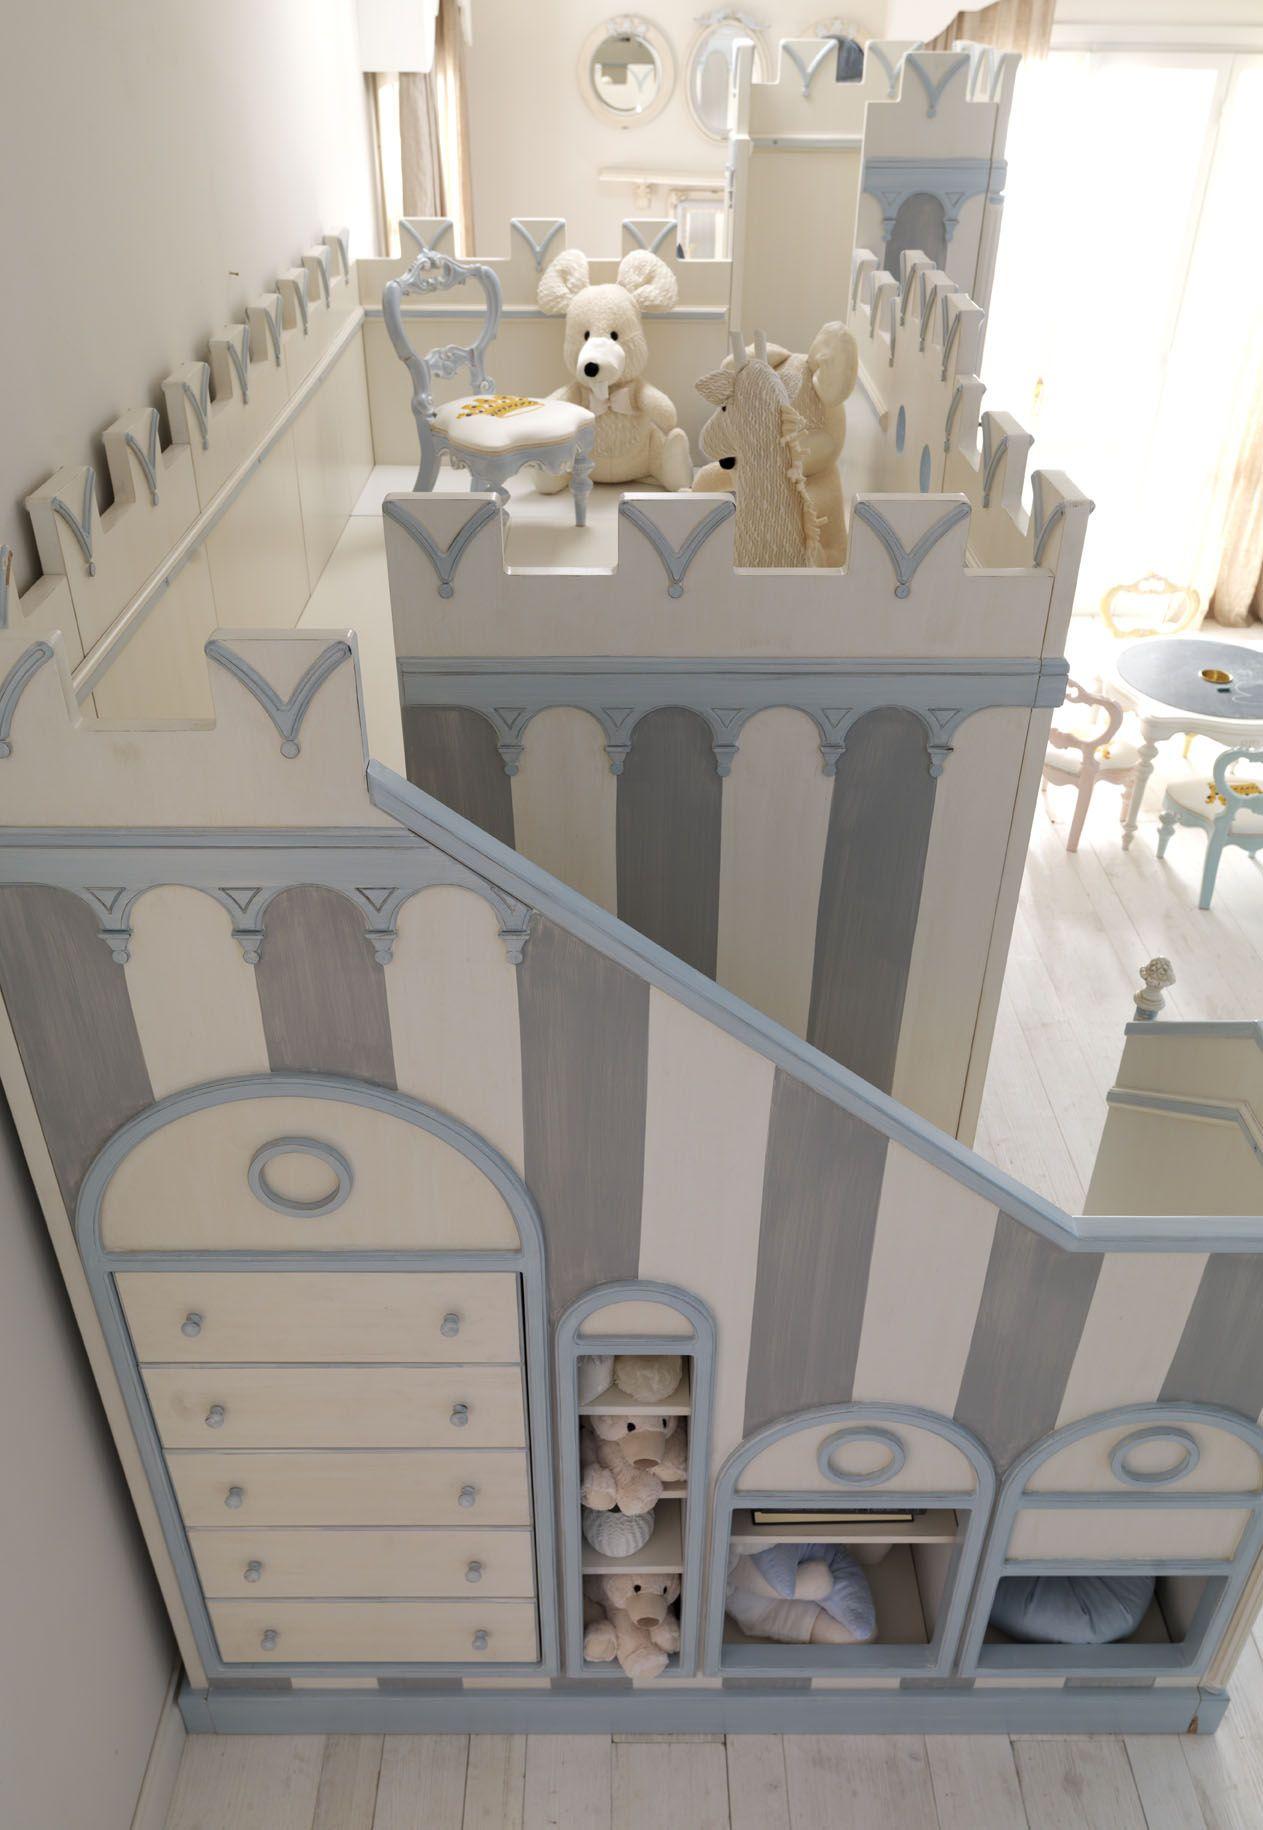 Playroom | Notte Fatata